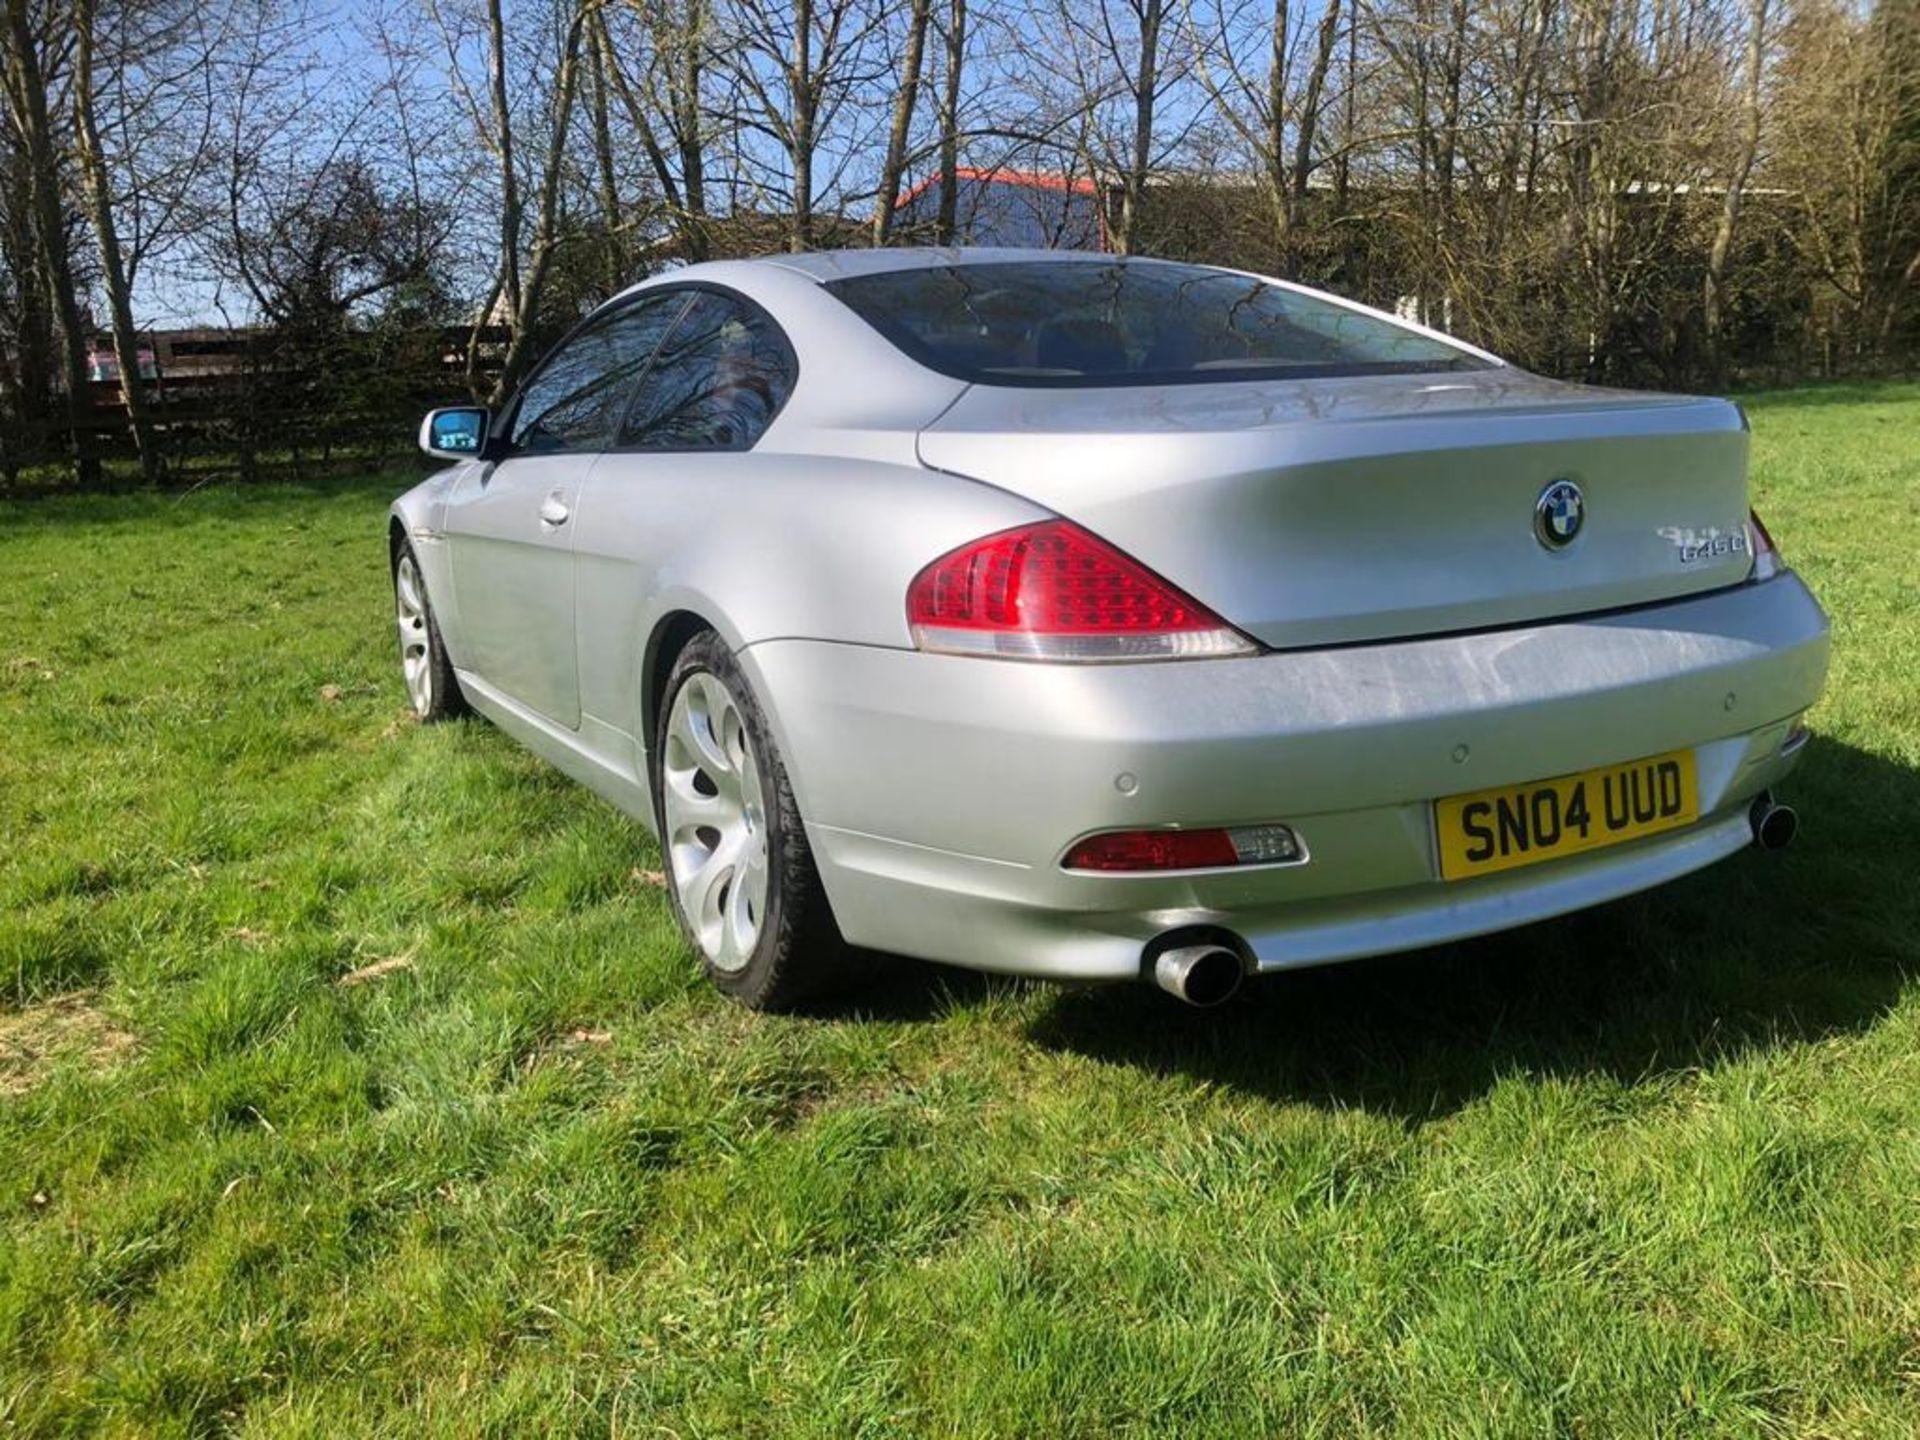 2004 BMW 645CI COUPE - Image 5 of 15